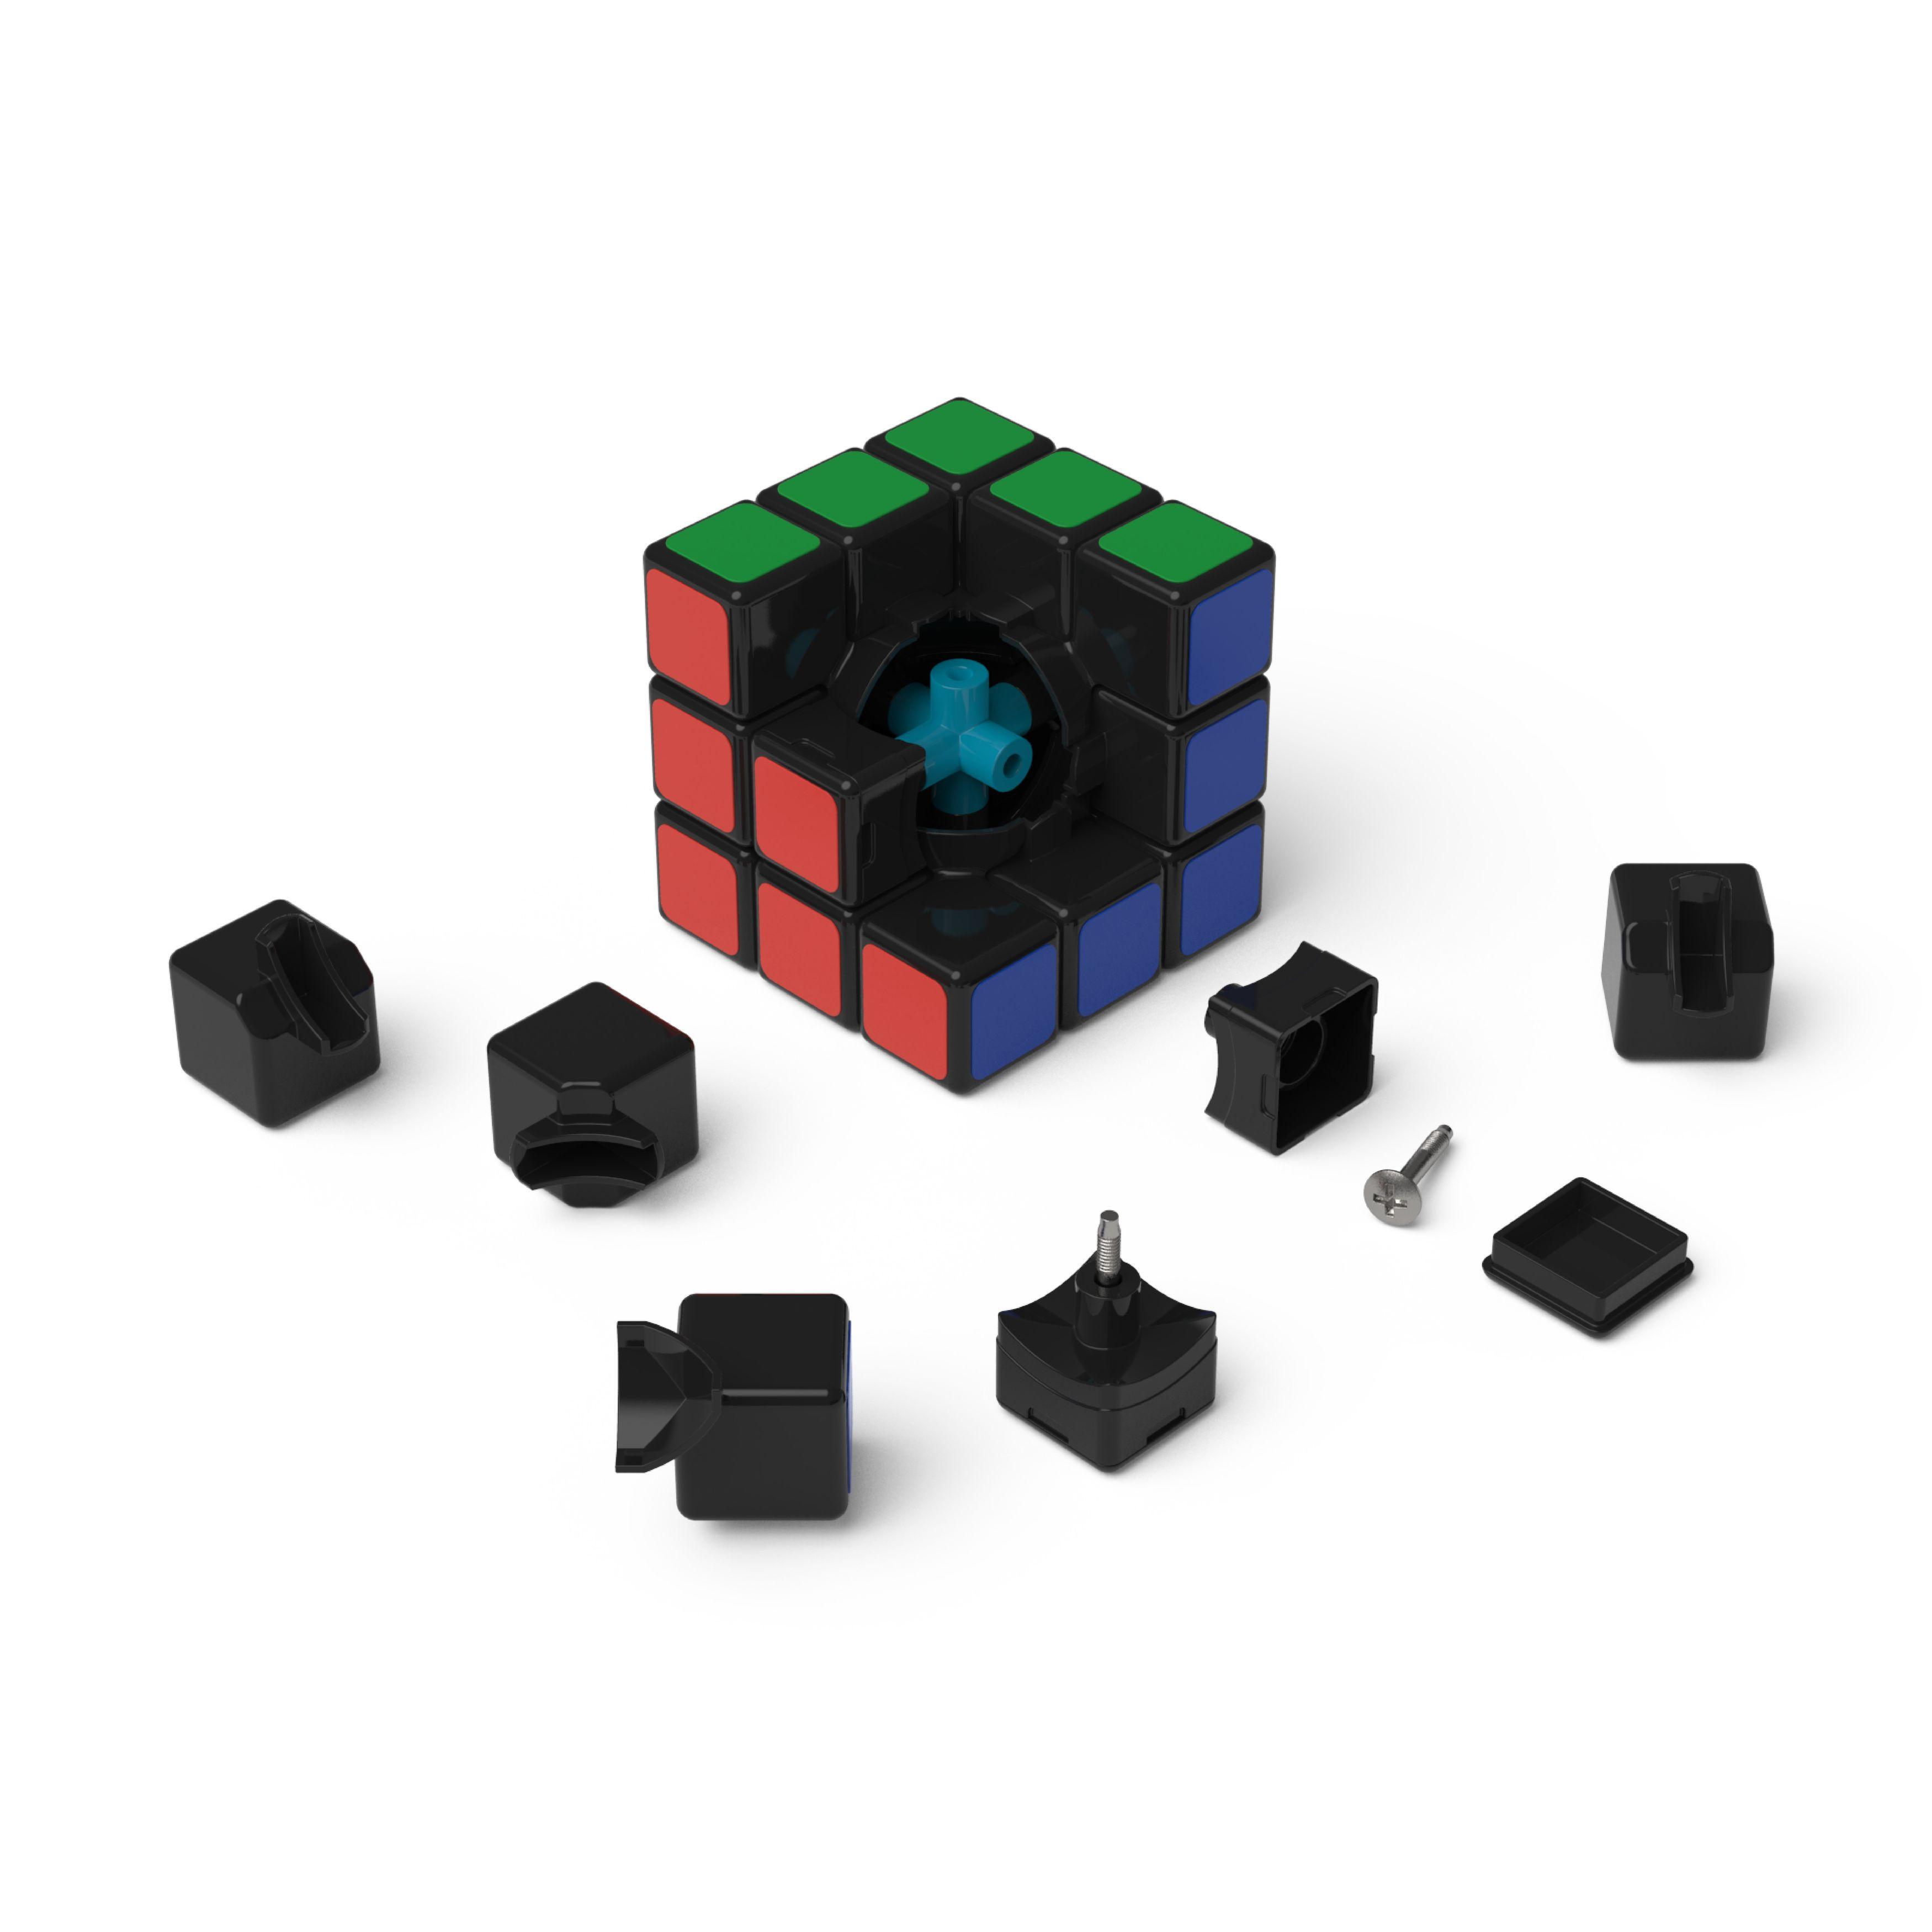 Rubiks-cube-05162018-01-3500-3500